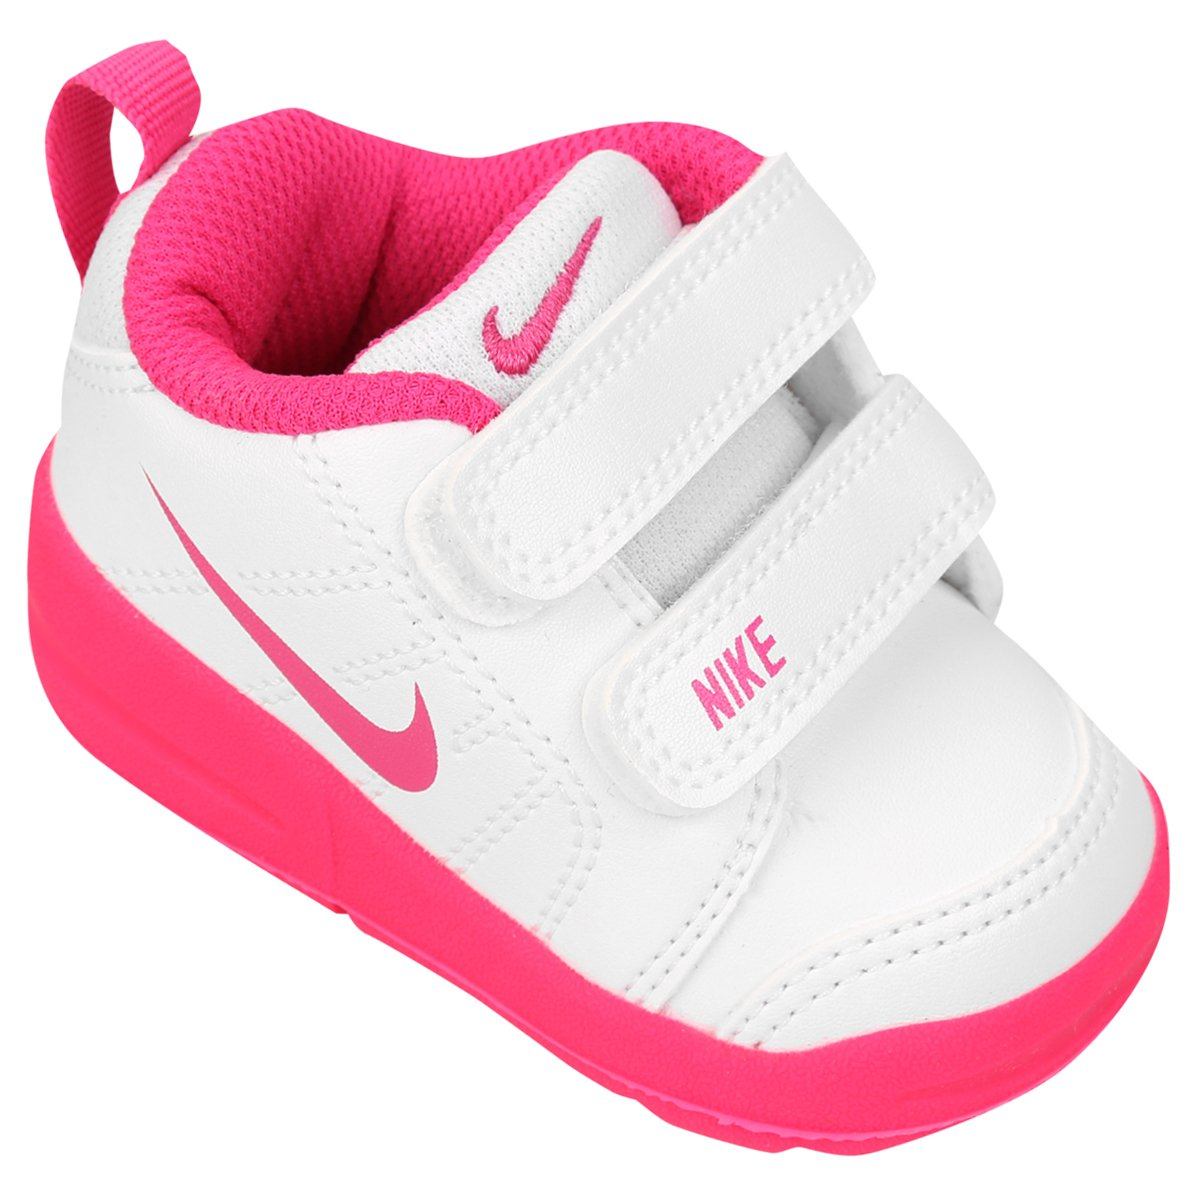 5d1f4978025 Tênis Infantil Nike Pico Lt - Branco e Pink - Compre Agora